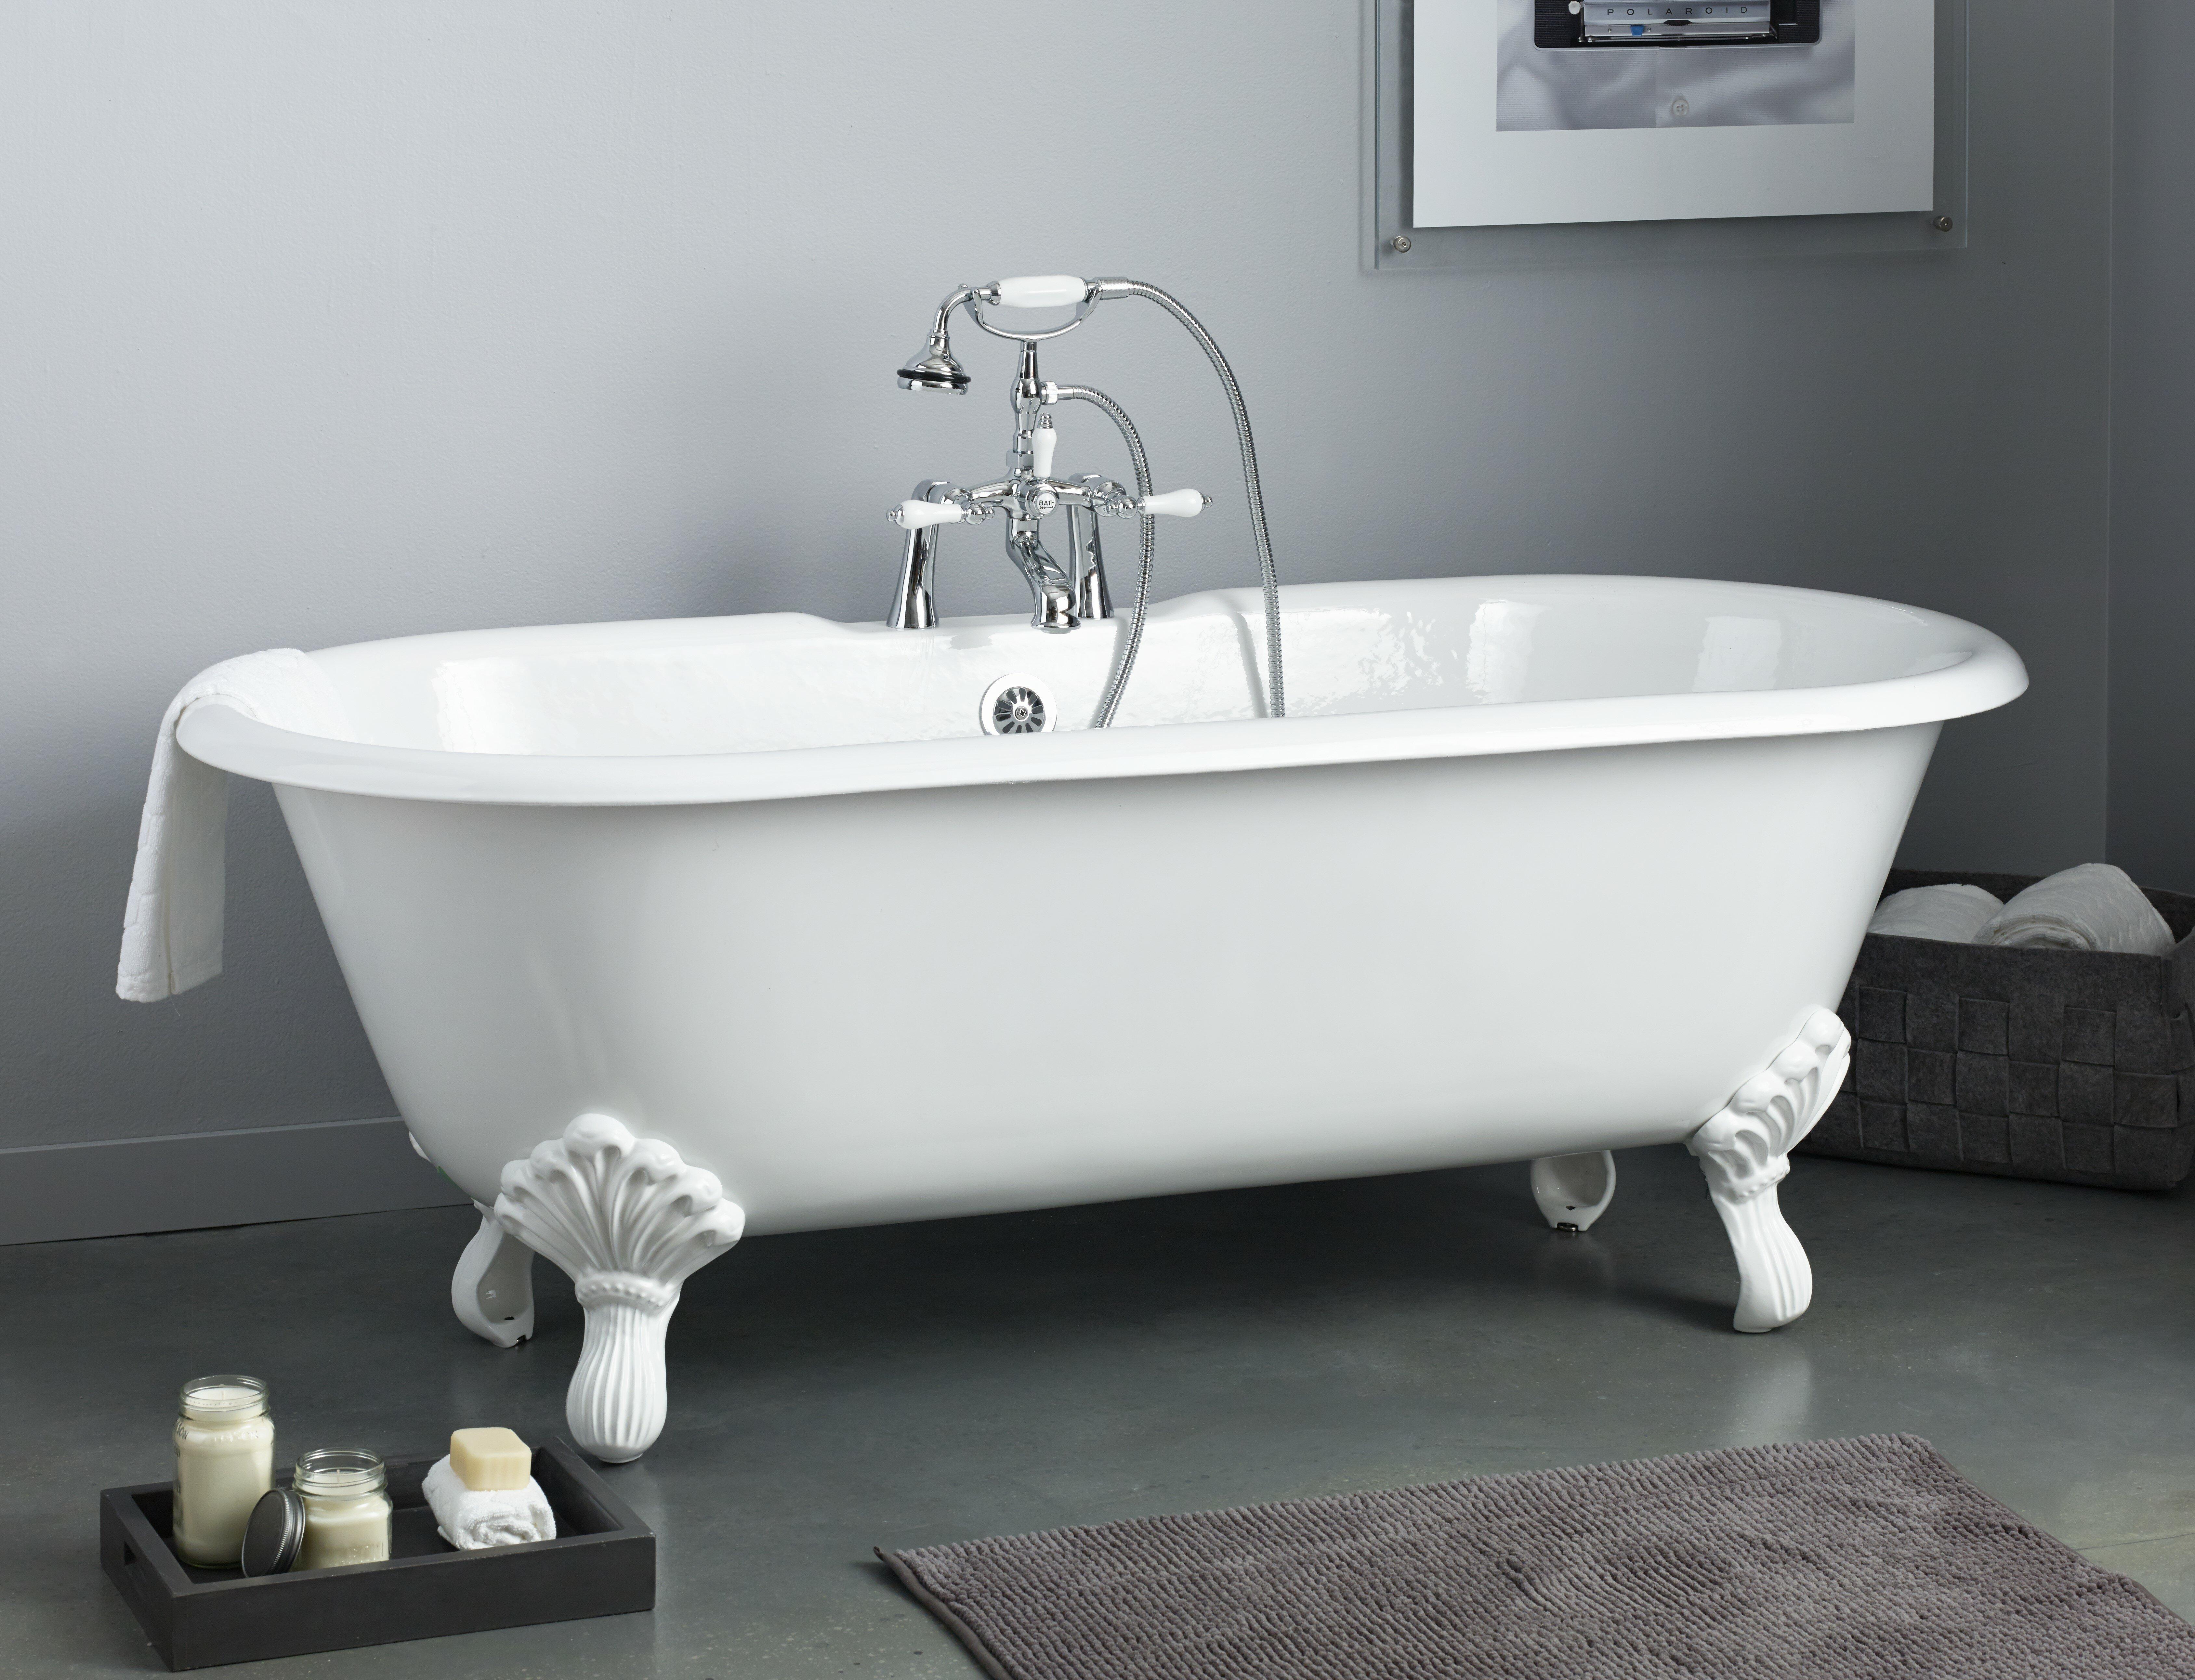 Regal 61 x 31 soaking bathtub